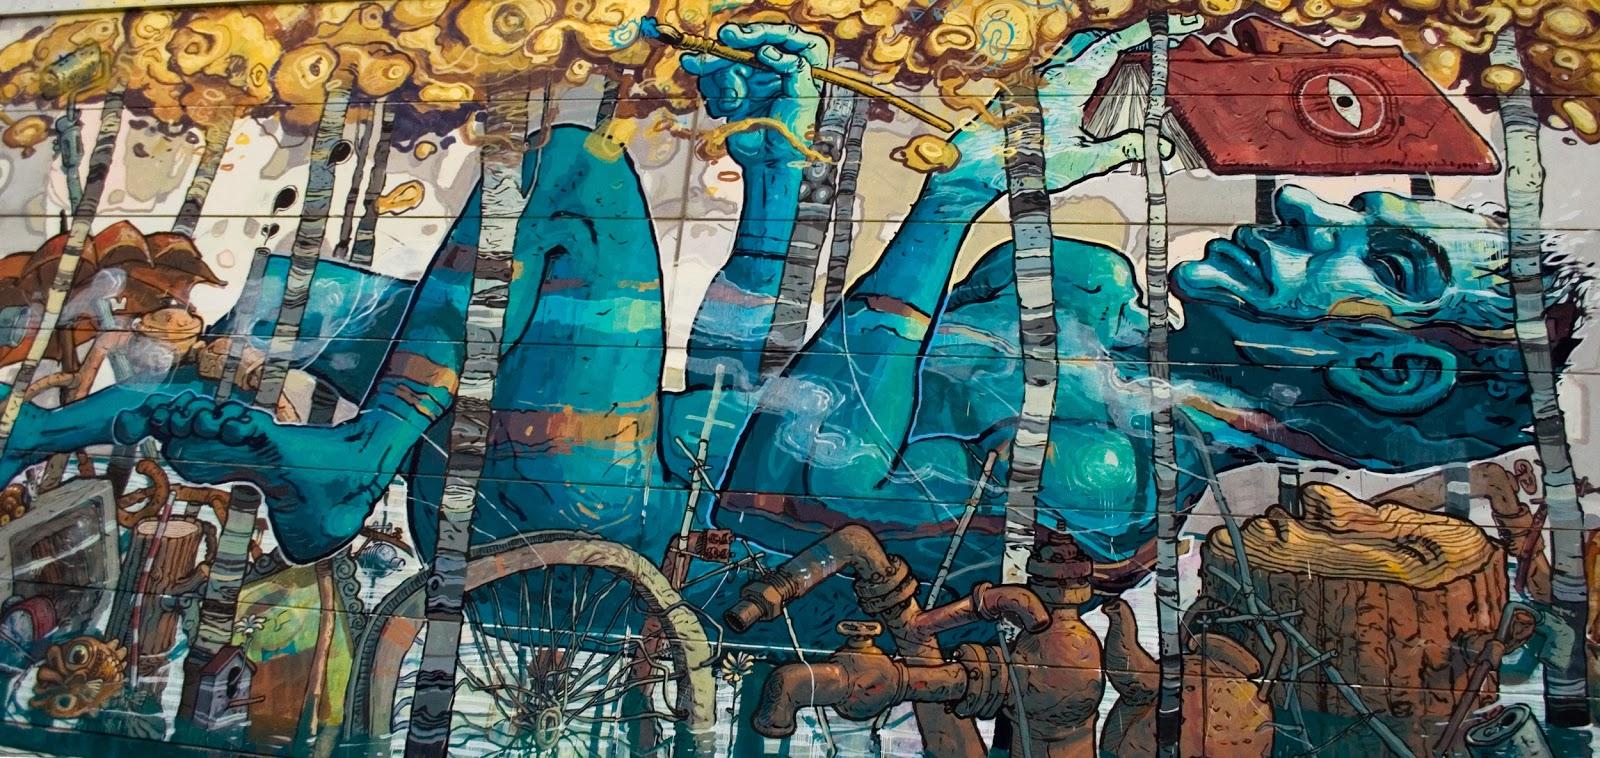 Riquiño-new-mural-at-desordes-creativas-2013-11